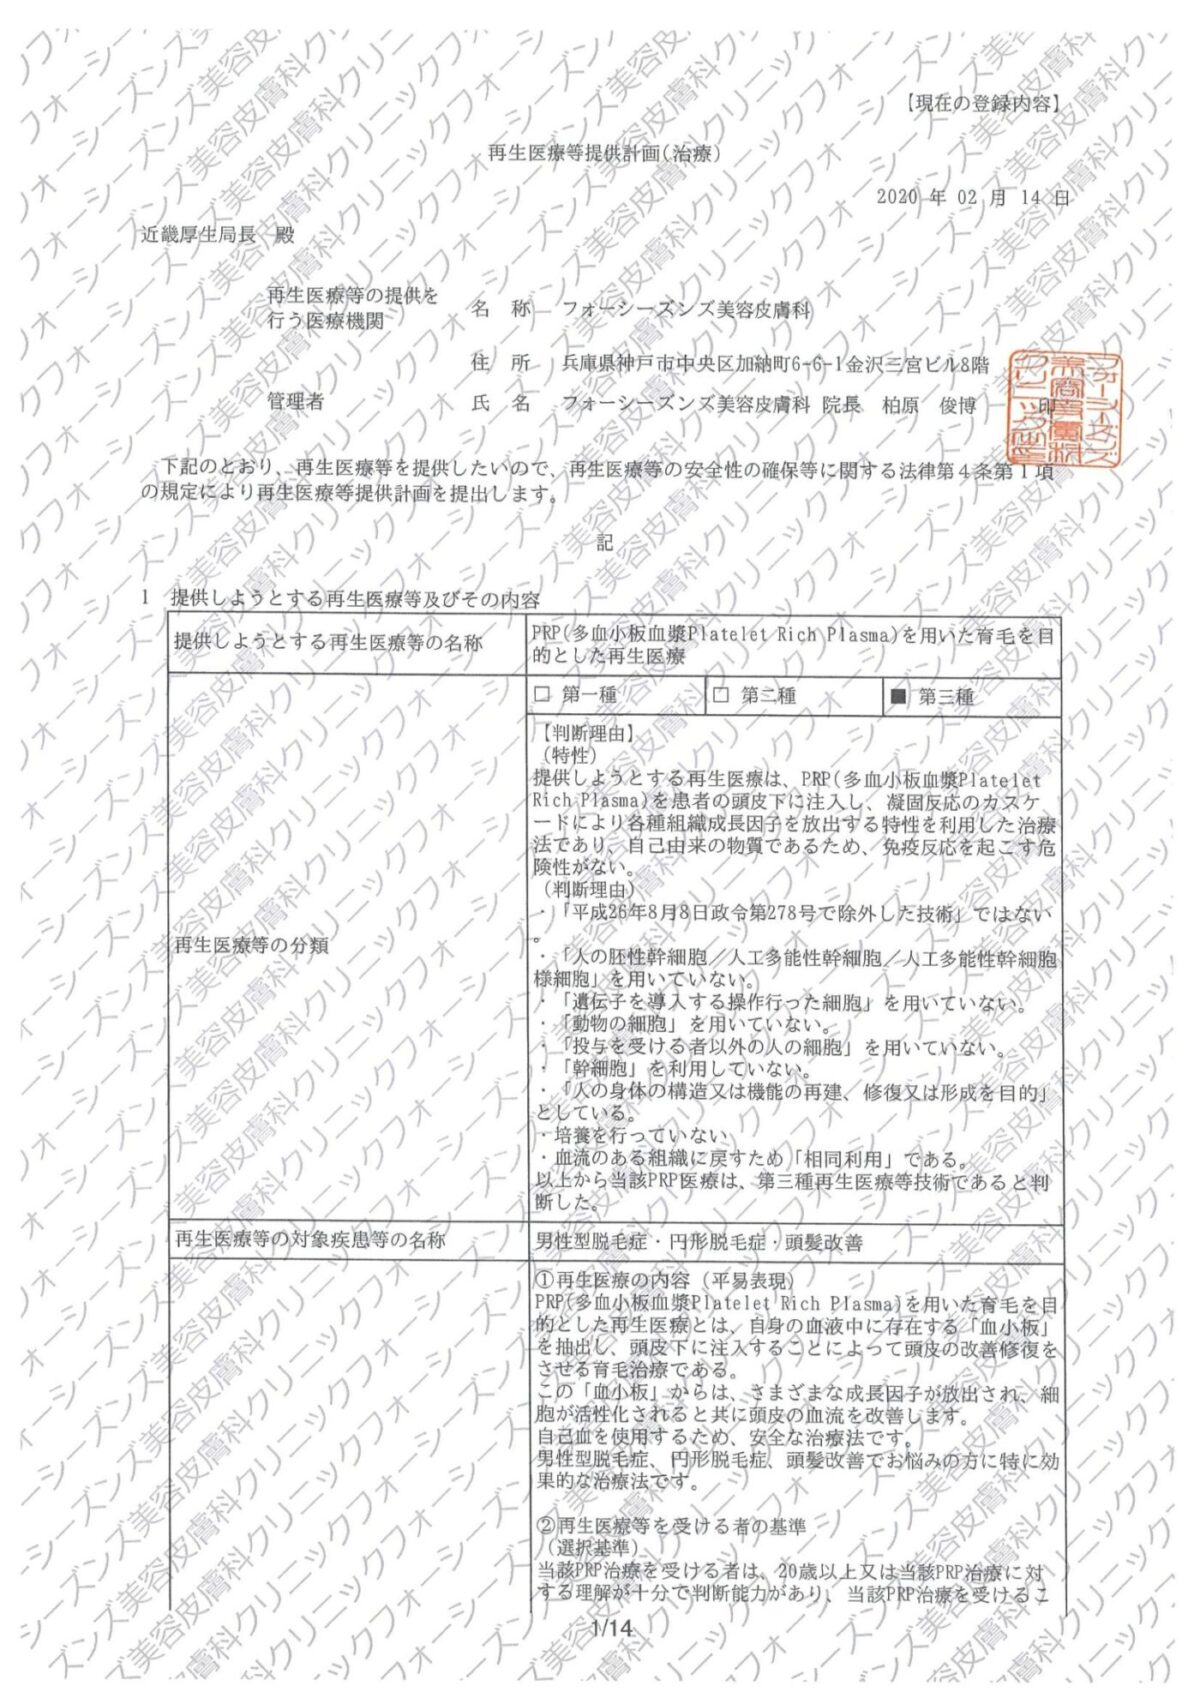 PRP育毛本院_再生医療等提供計画書_200428